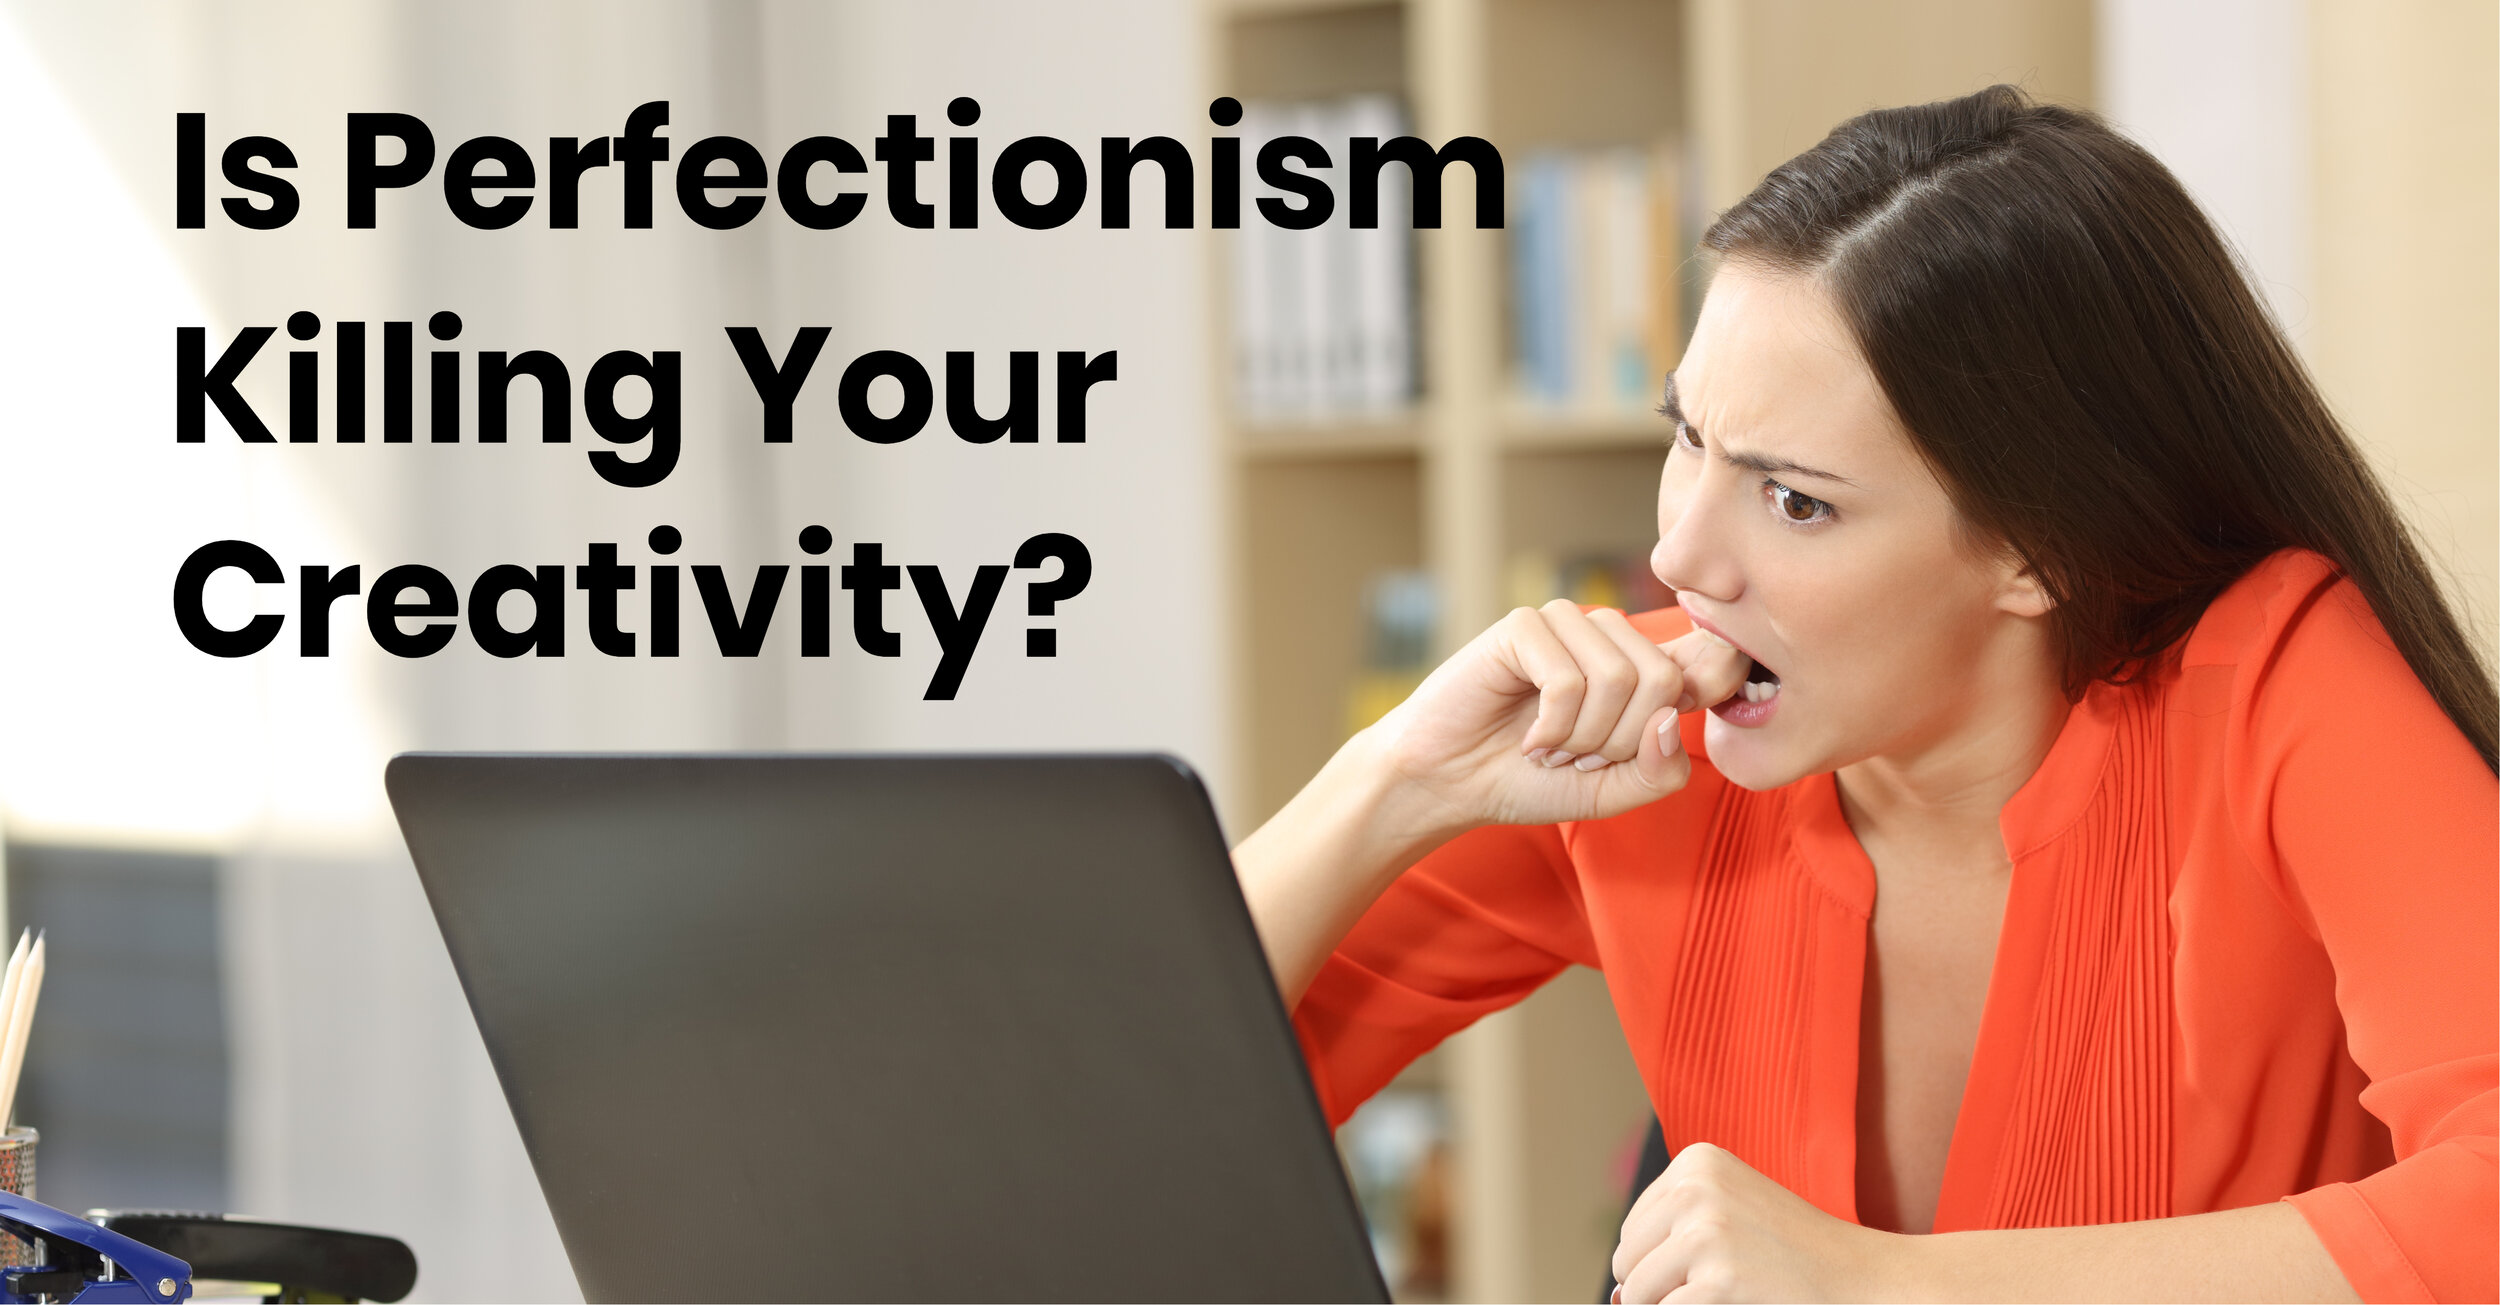 Carole Kirschner Perfectionism Killing Creativity Screenwriting.jpg